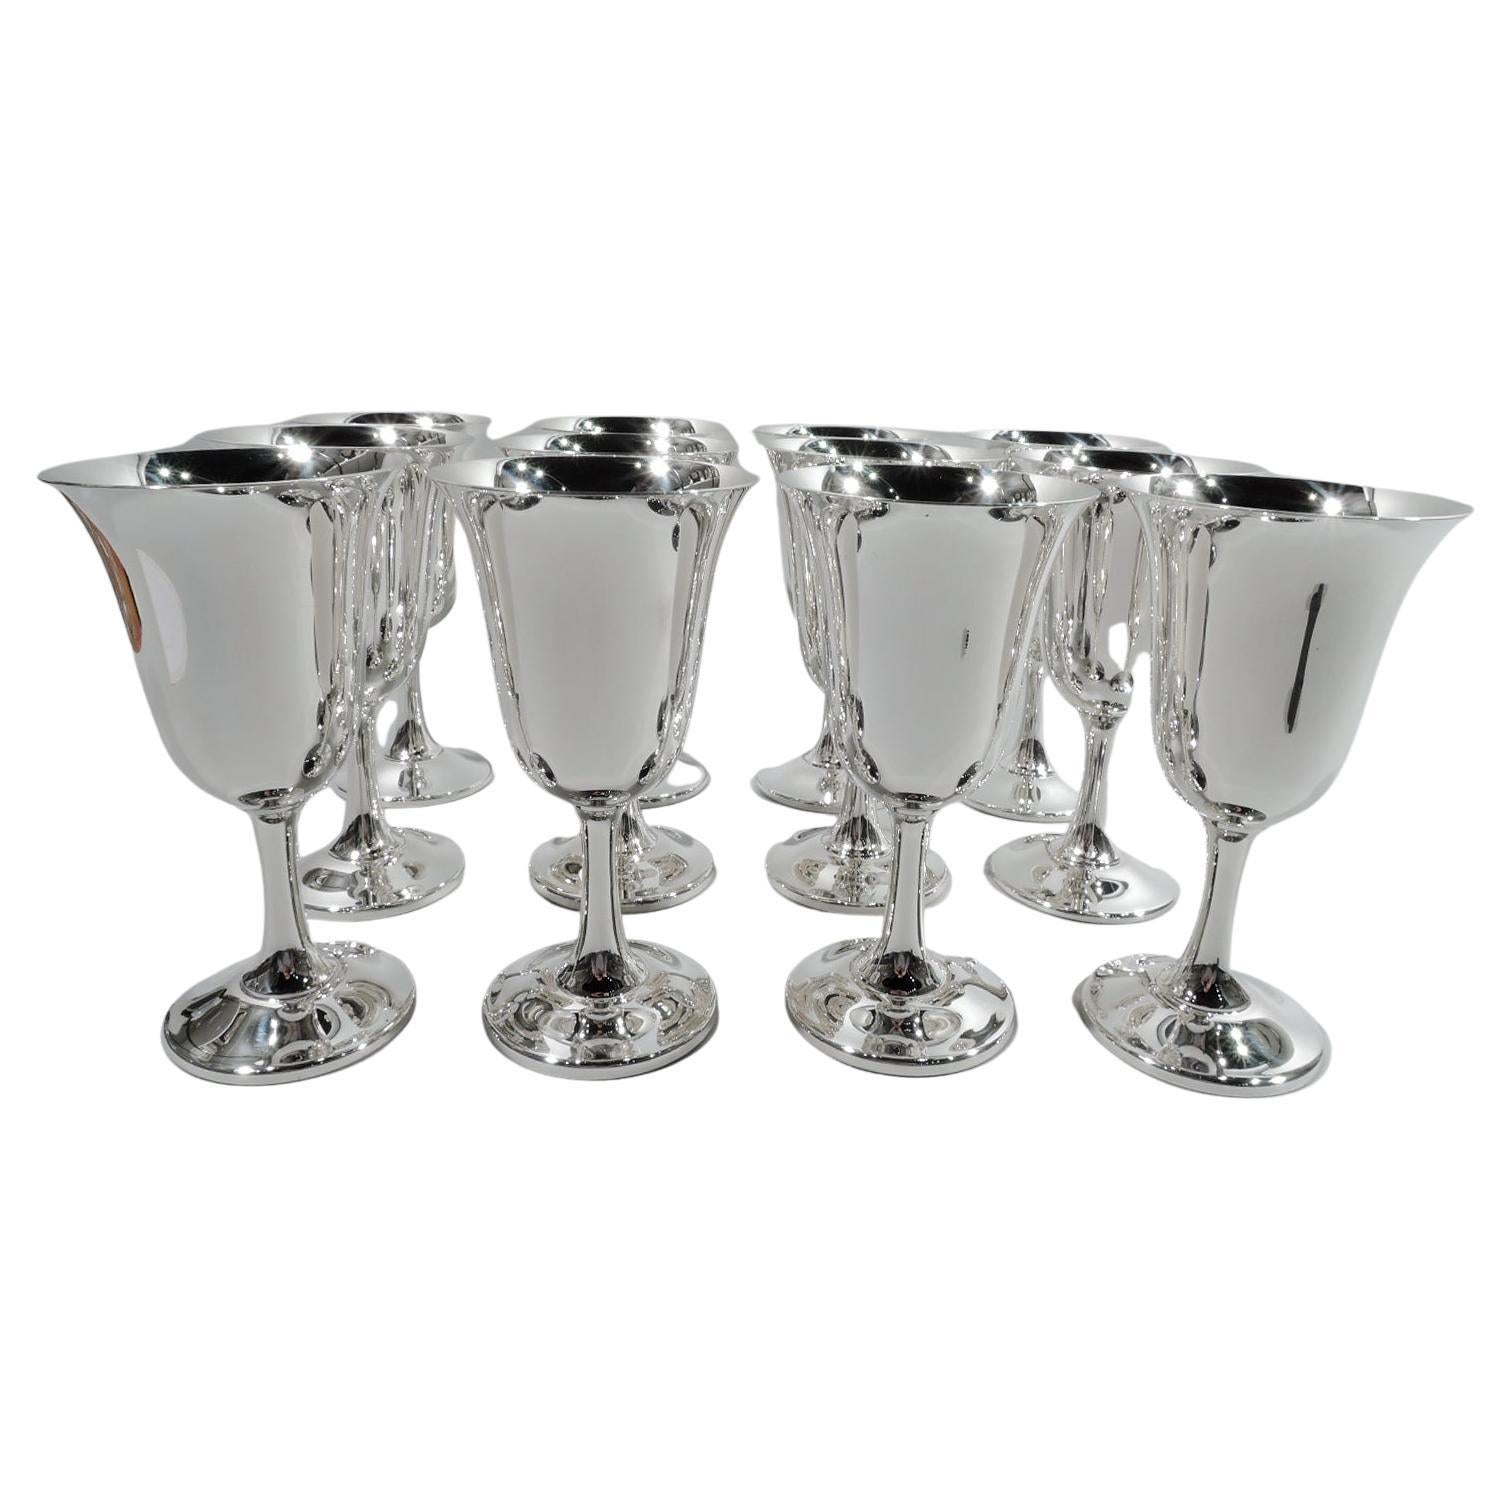 Set of 12 American Modern Sterling Silver Goblets